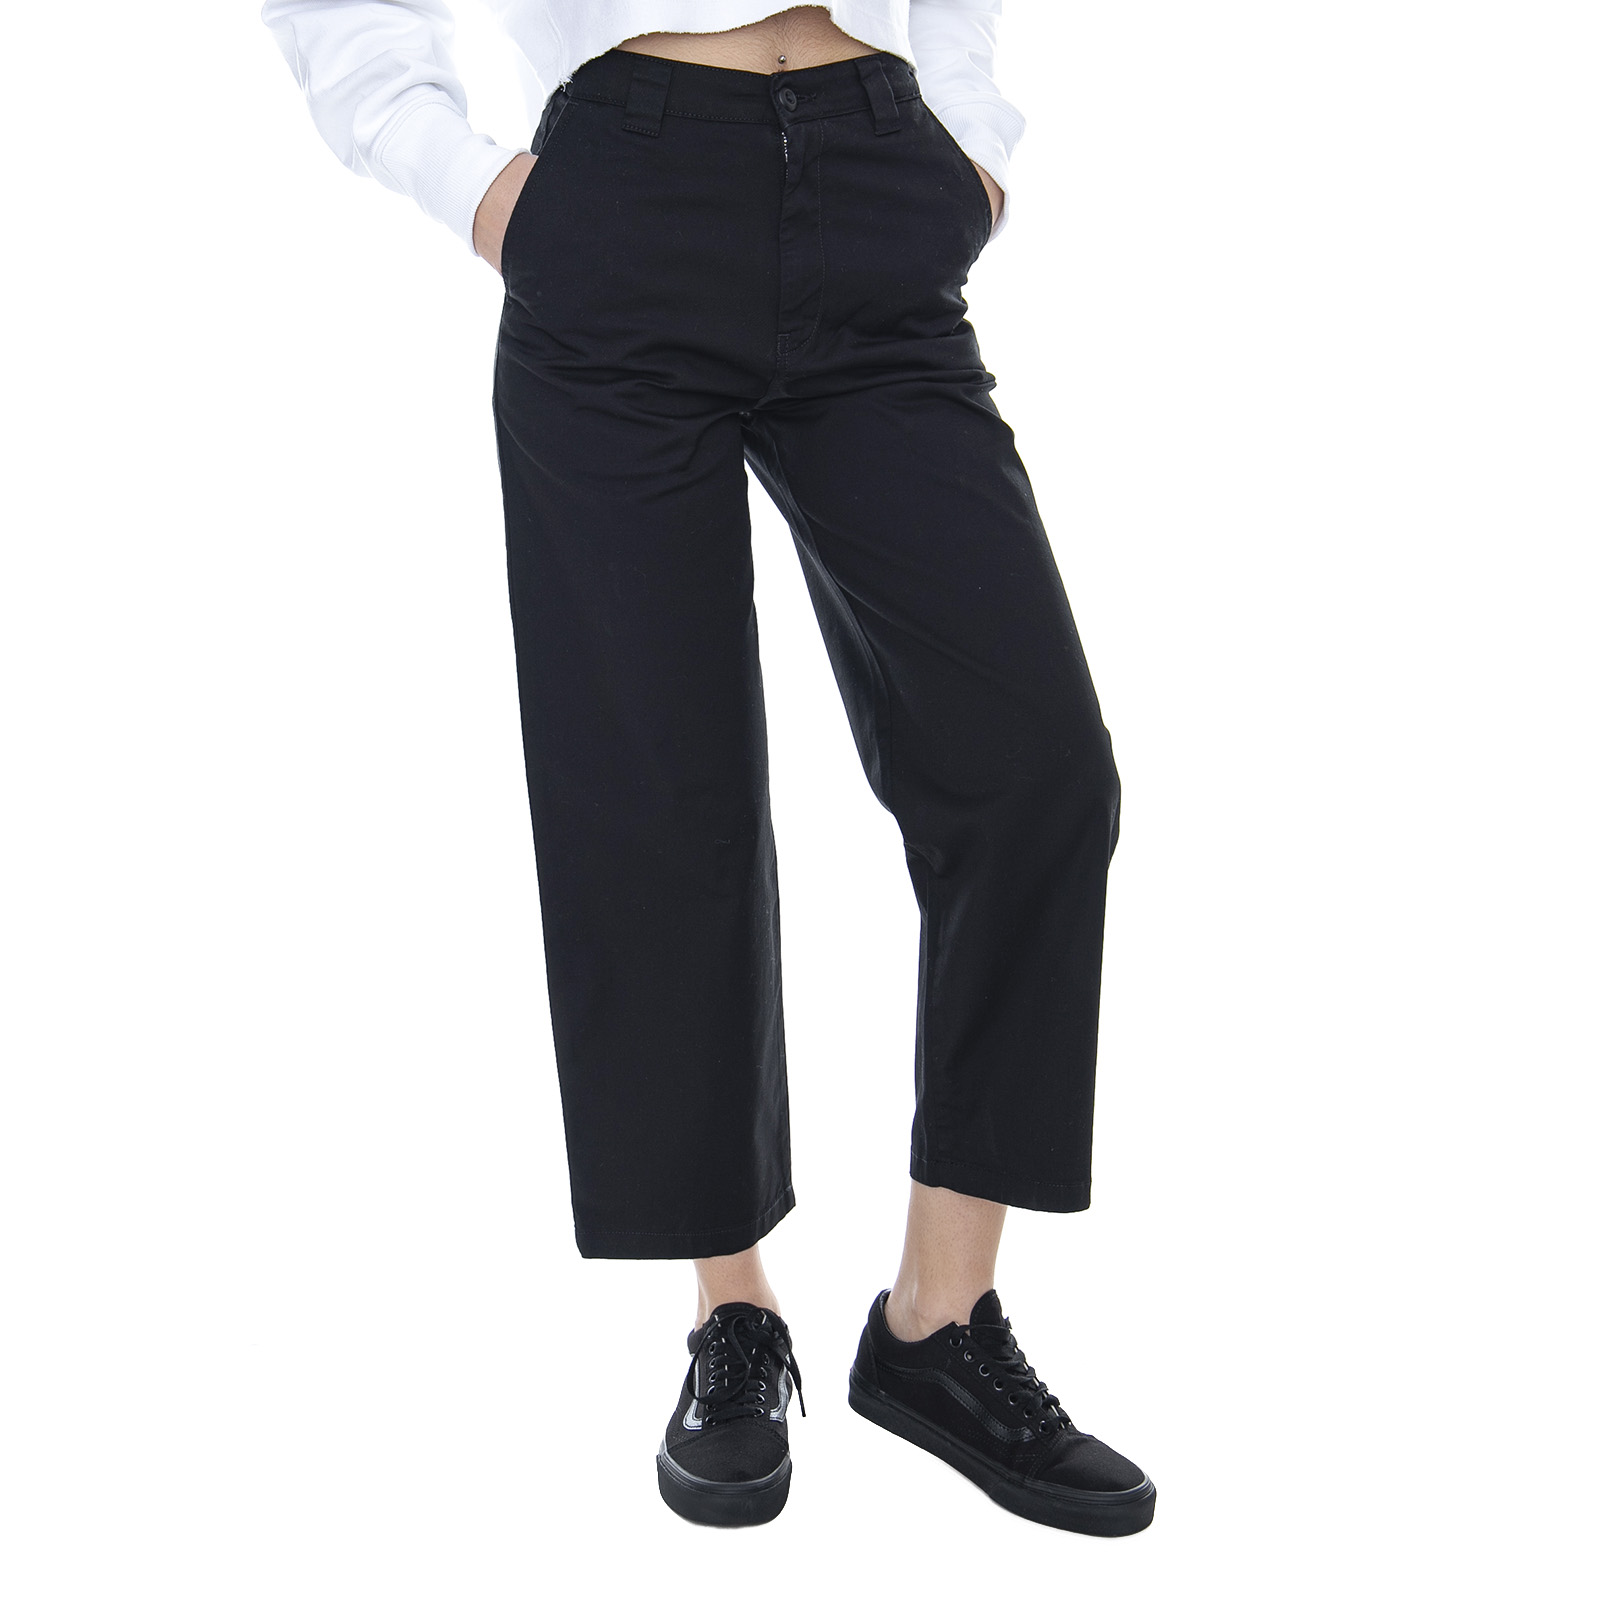 Negro Black Detalles Pantalones Carhartt De W Master Jadear Mujer Great u5TlFK13Jc